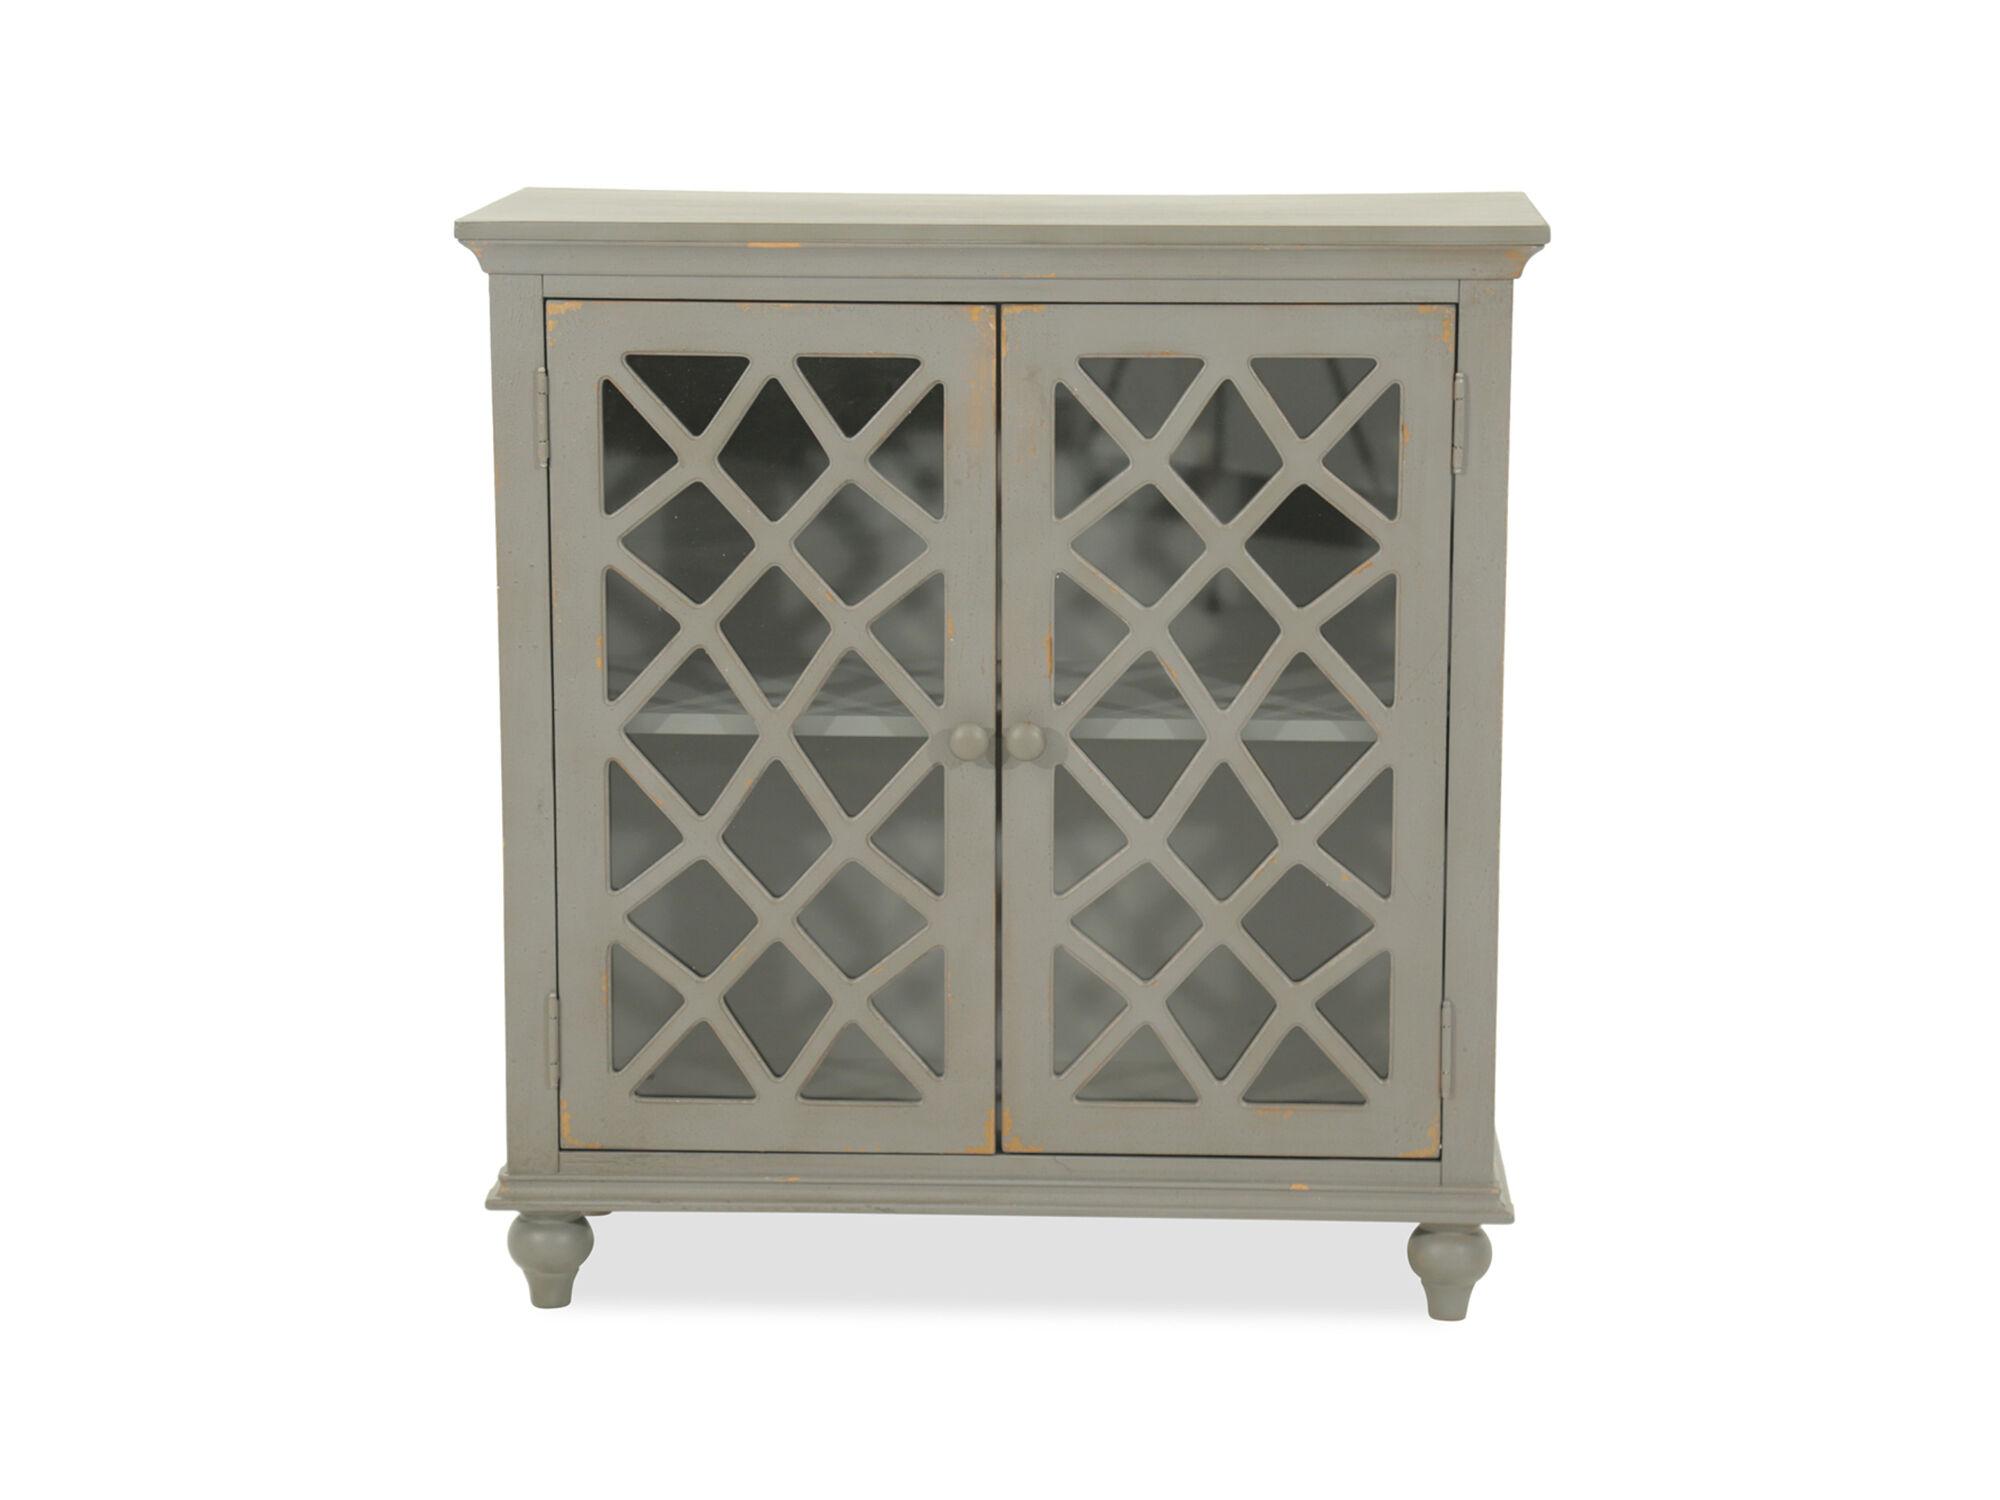 Beau Images 38u0026#39;u0026#39; Lattice Doors Cottage Small Accent Cabinet ...